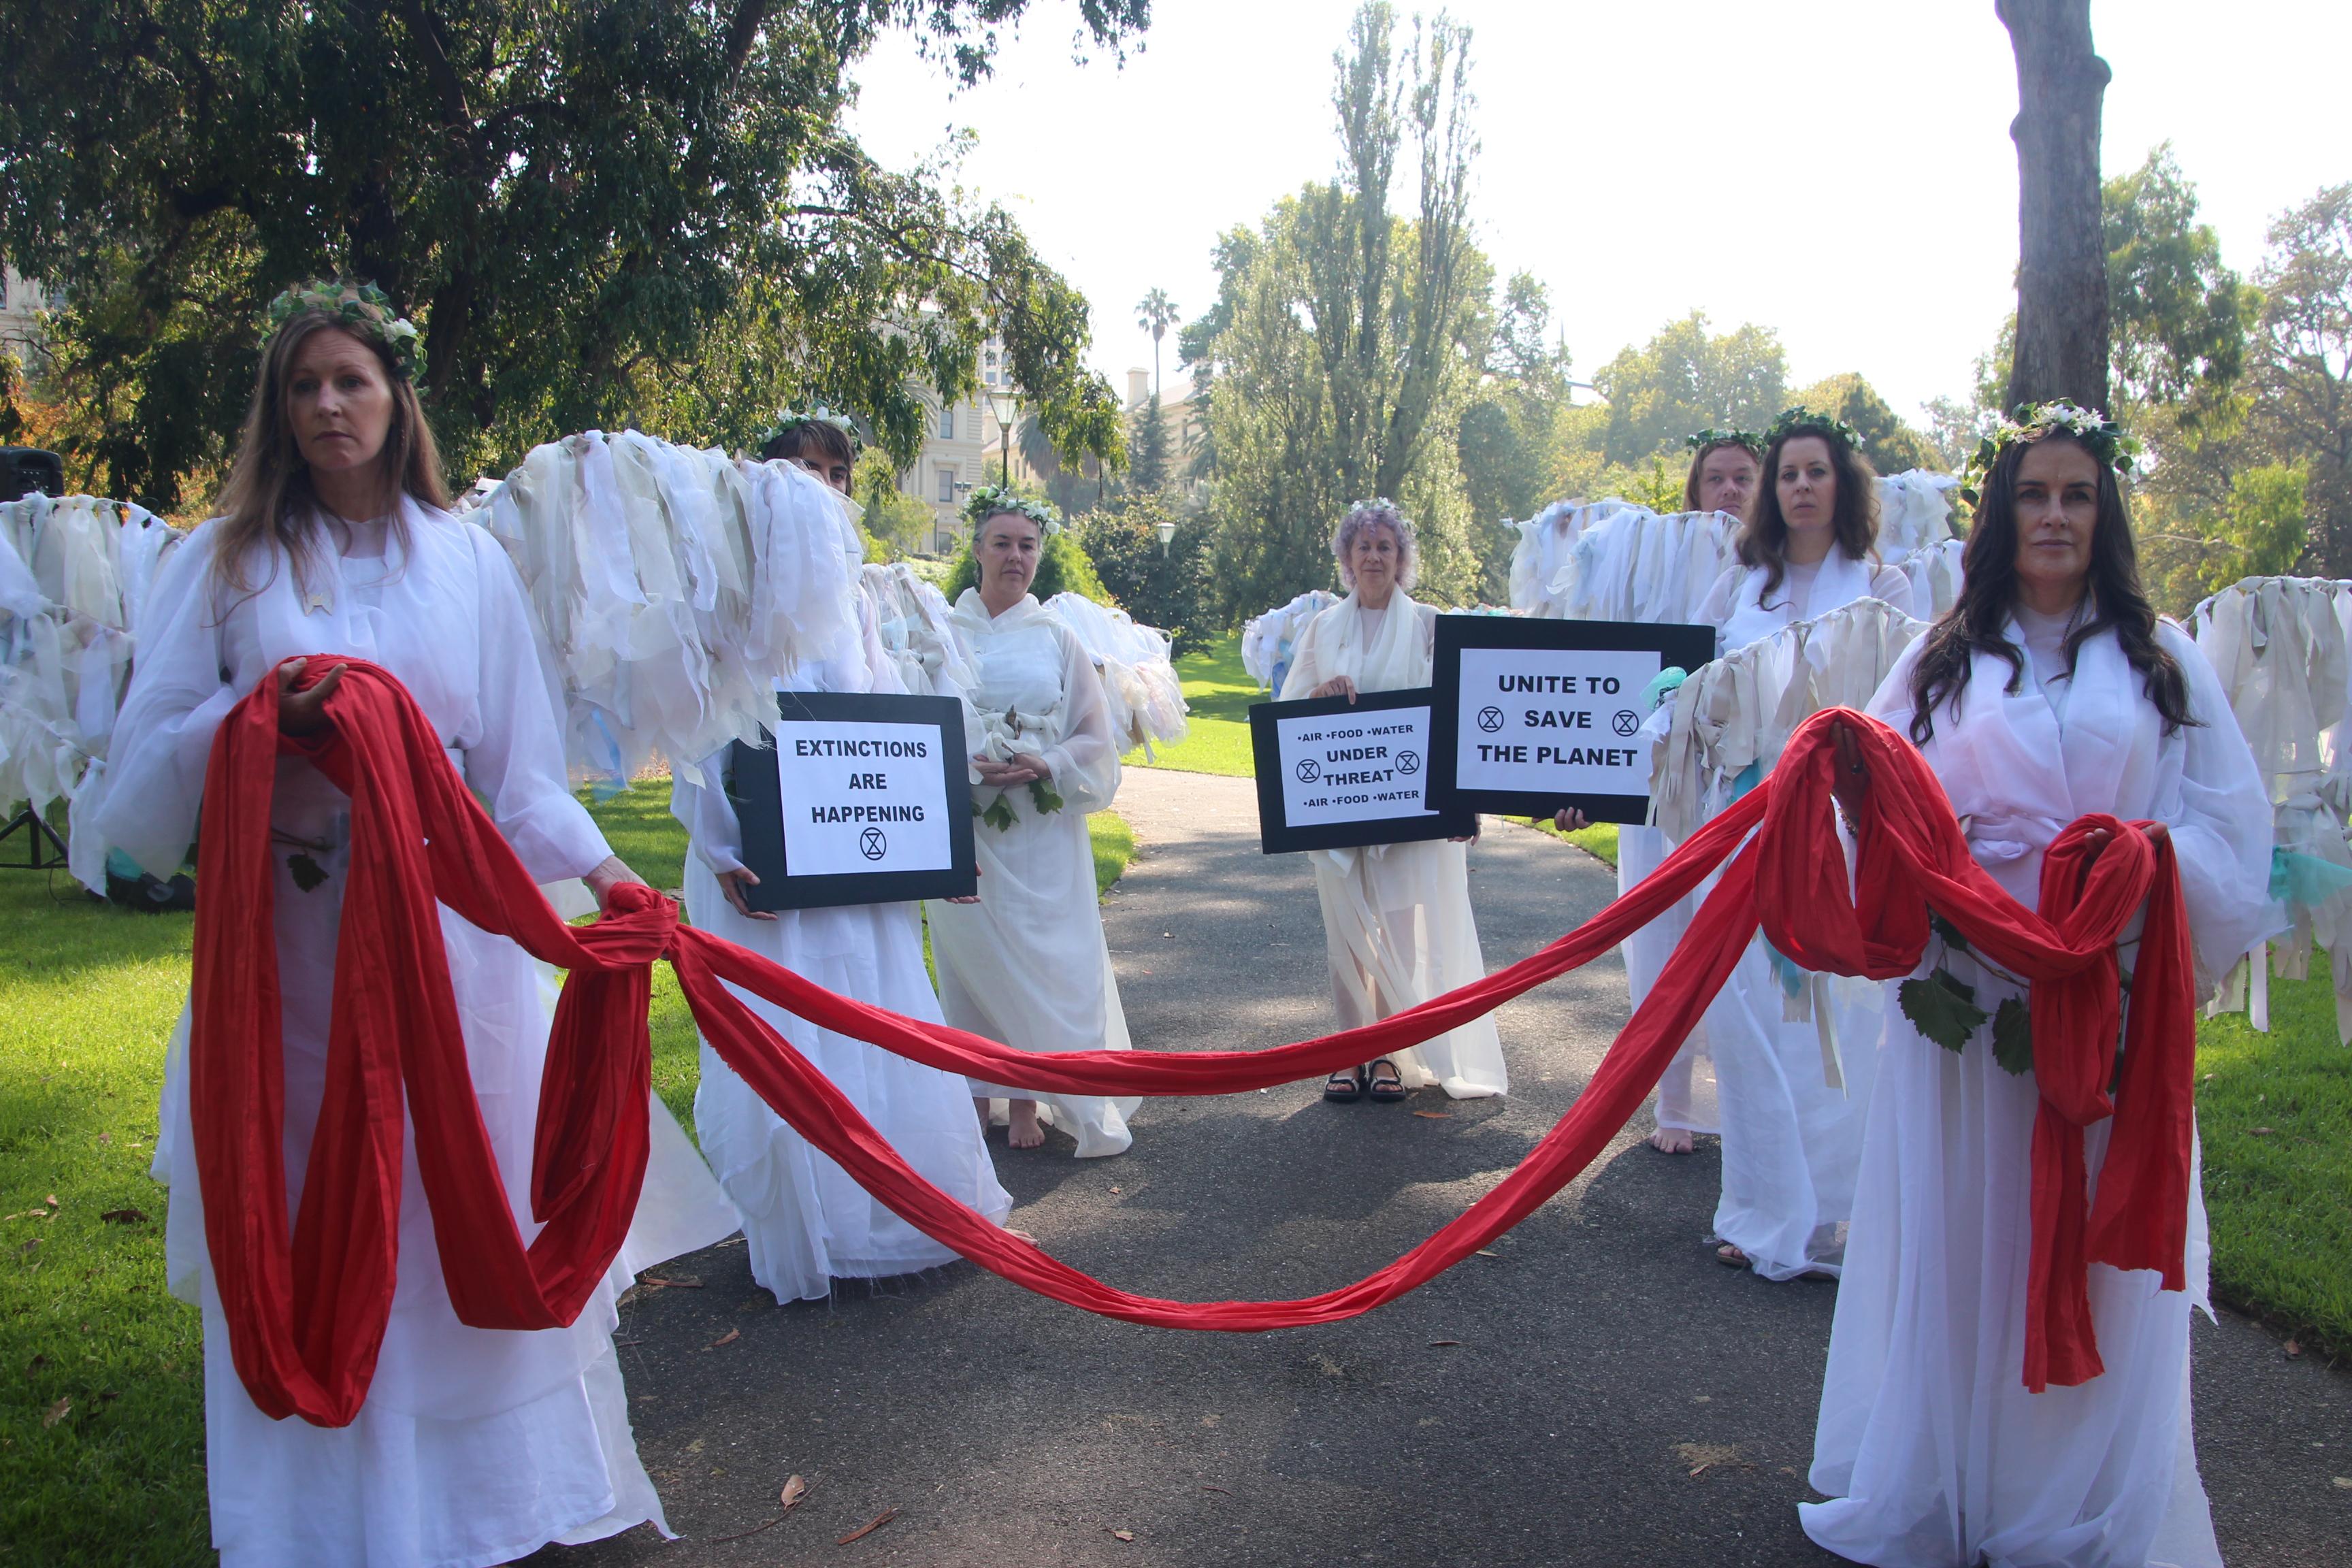 Climate Angels at Extinction Rebellion Declaration Day Melbourne